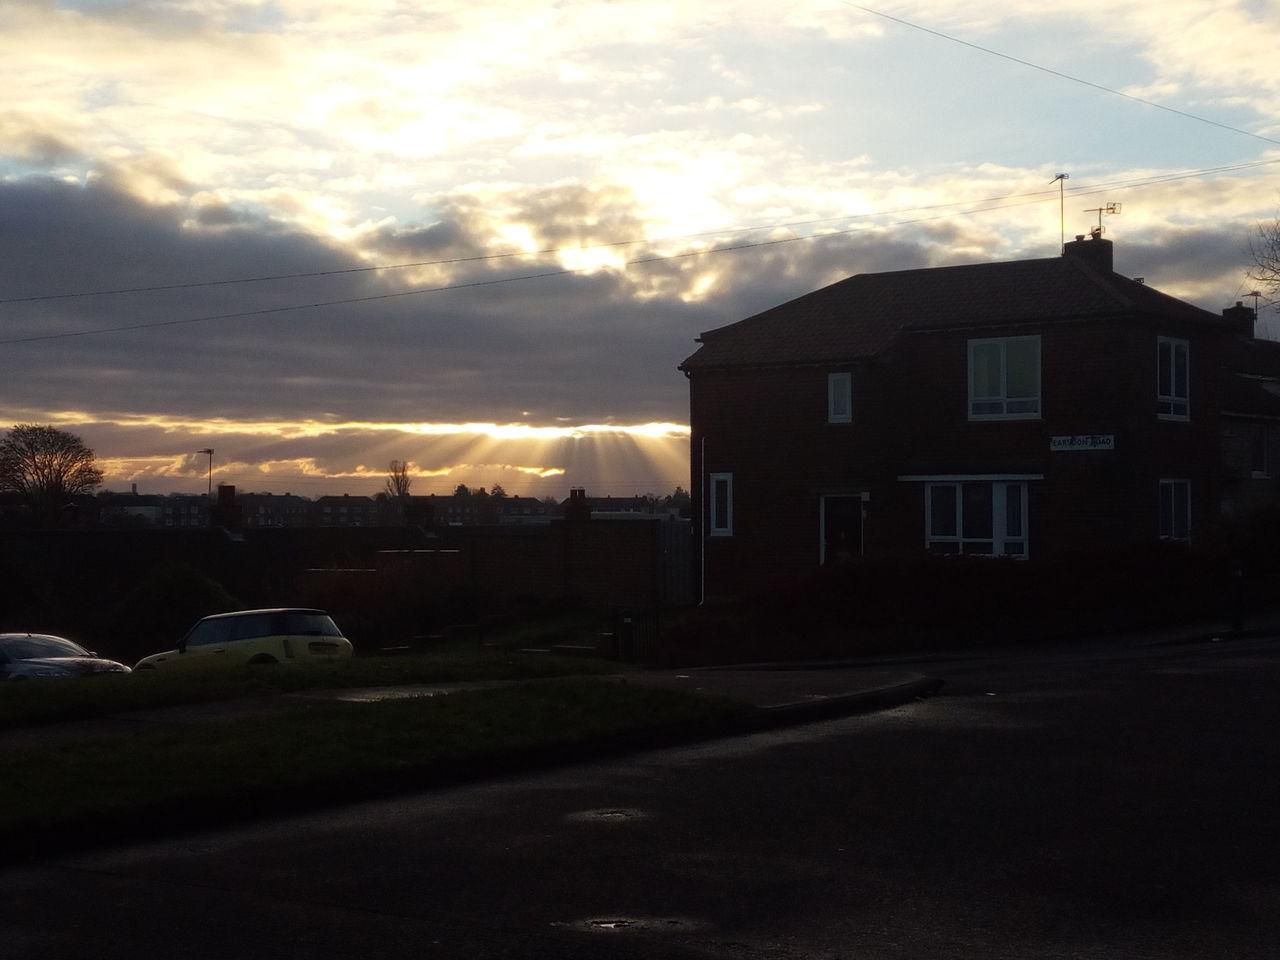 Cloud - Sky Sunlight And Shadows Outdoors Suburban Landscape